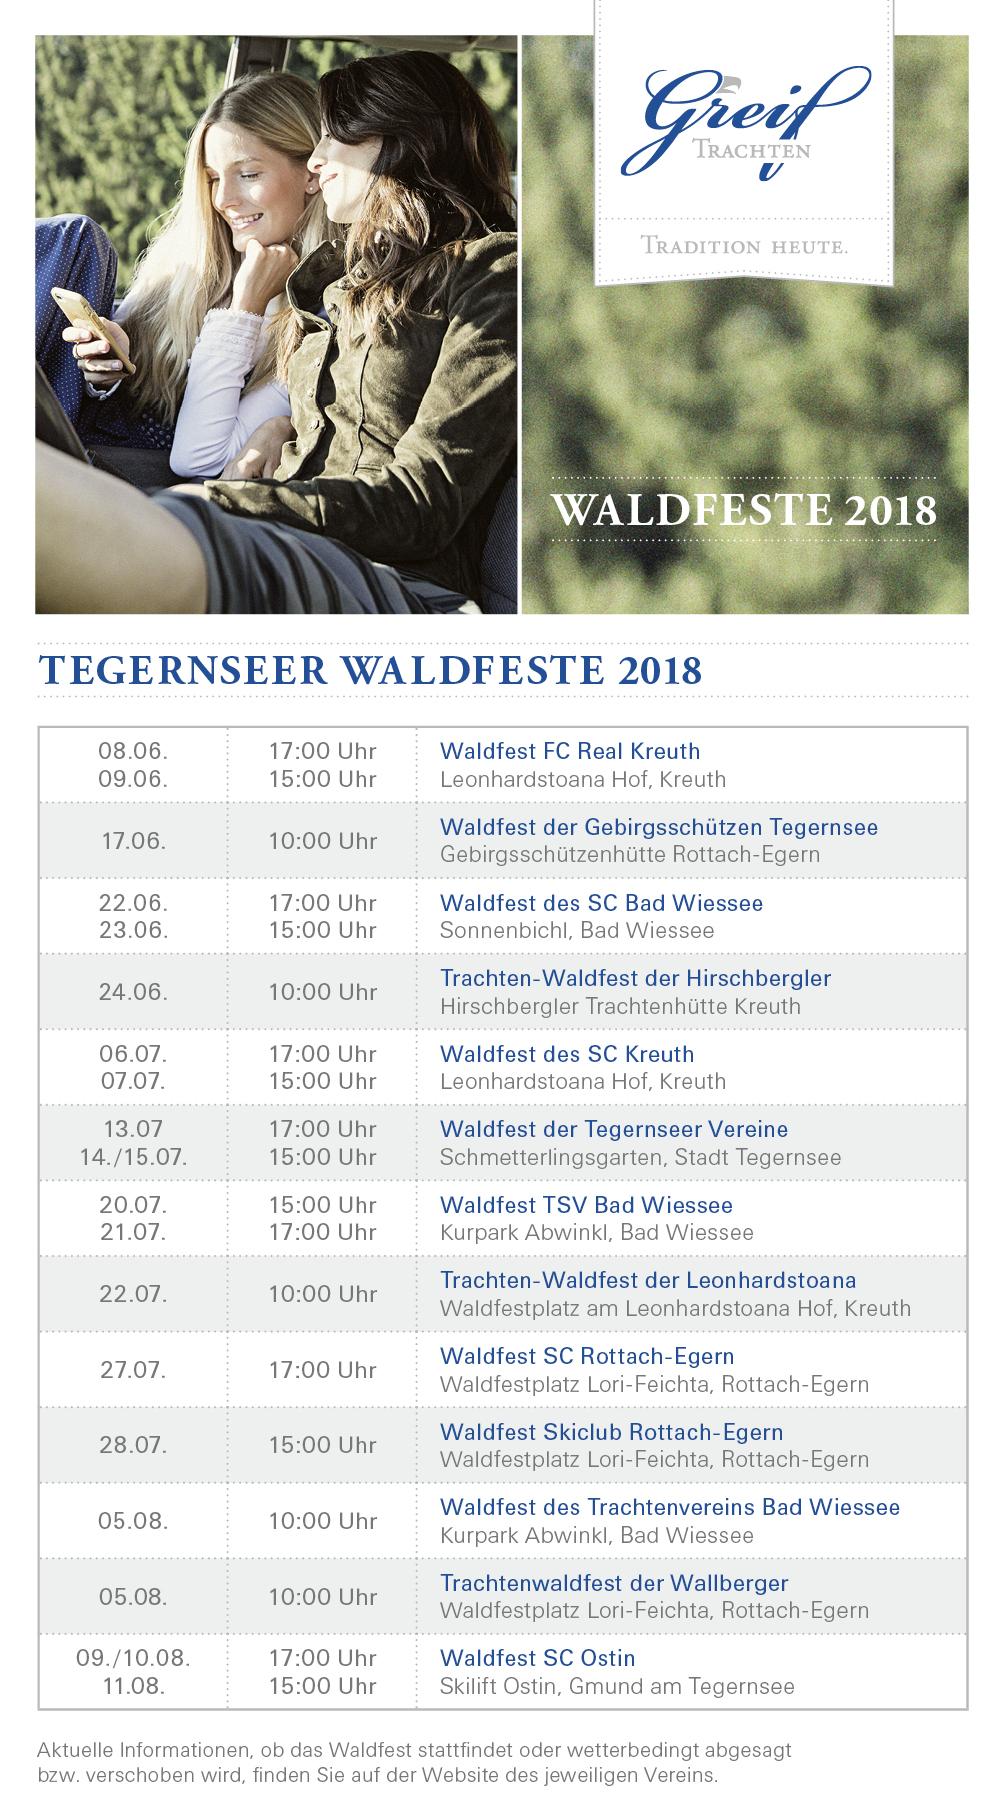 Trachten_Greif_Waldfestkalender_FB_2018.jpg